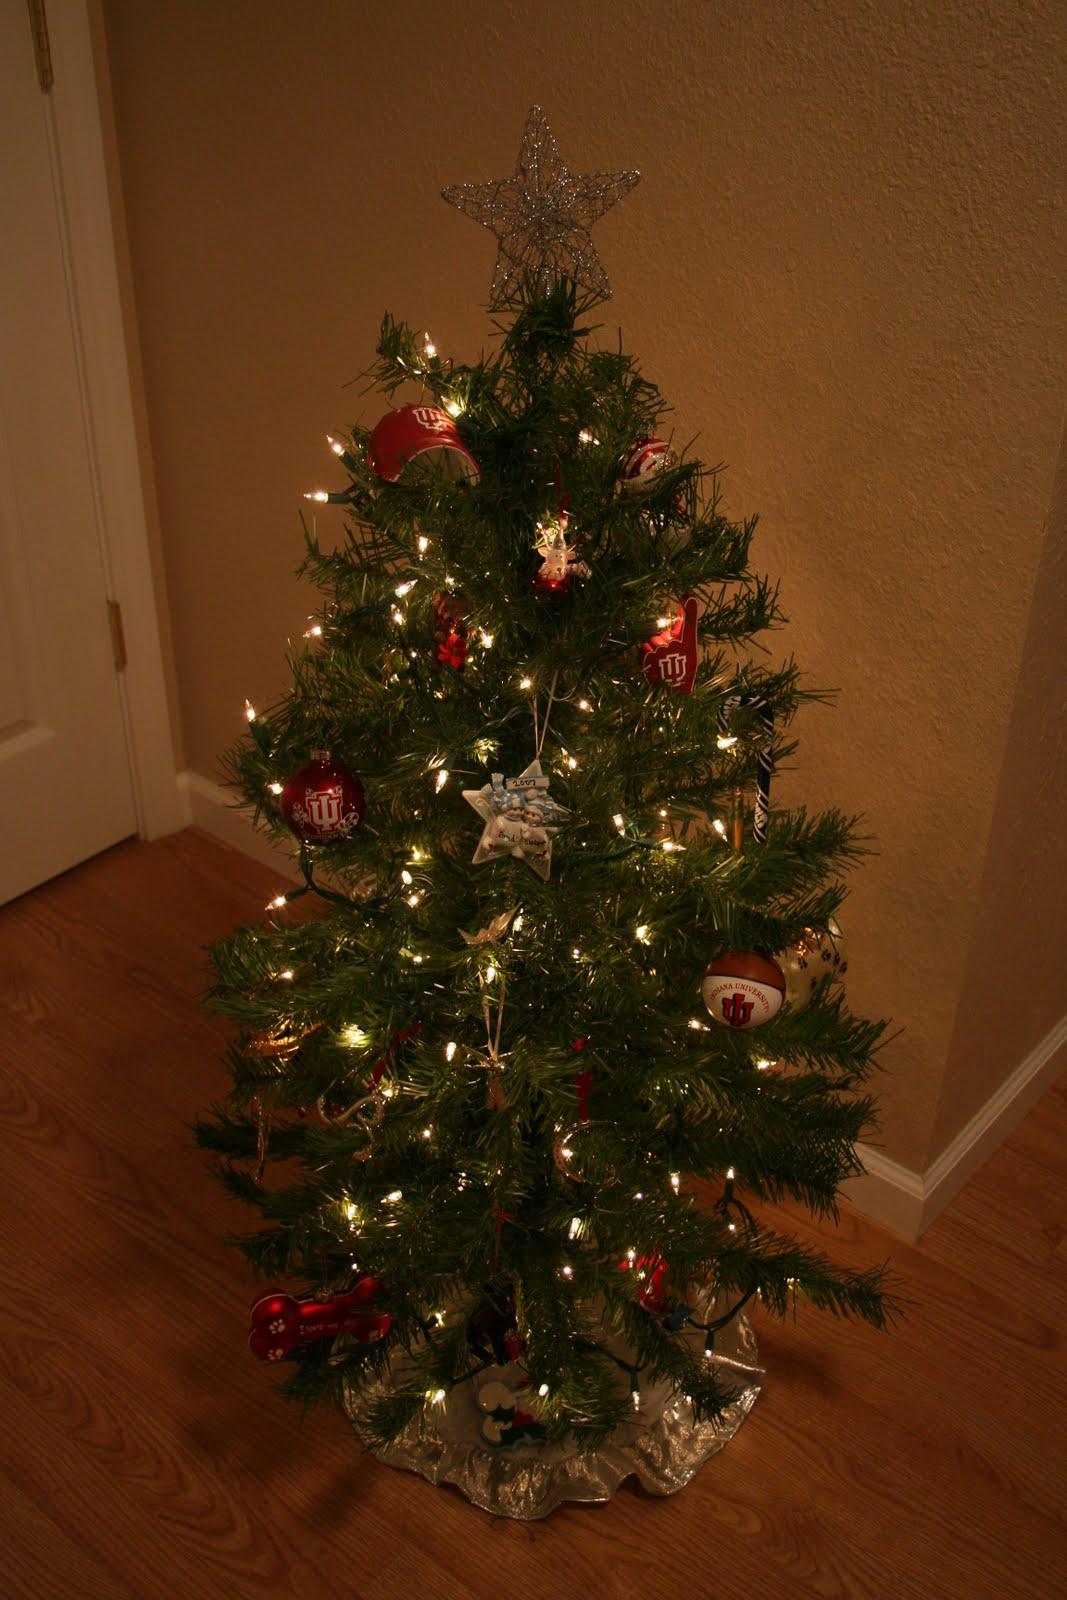 Sunday December 5 2010